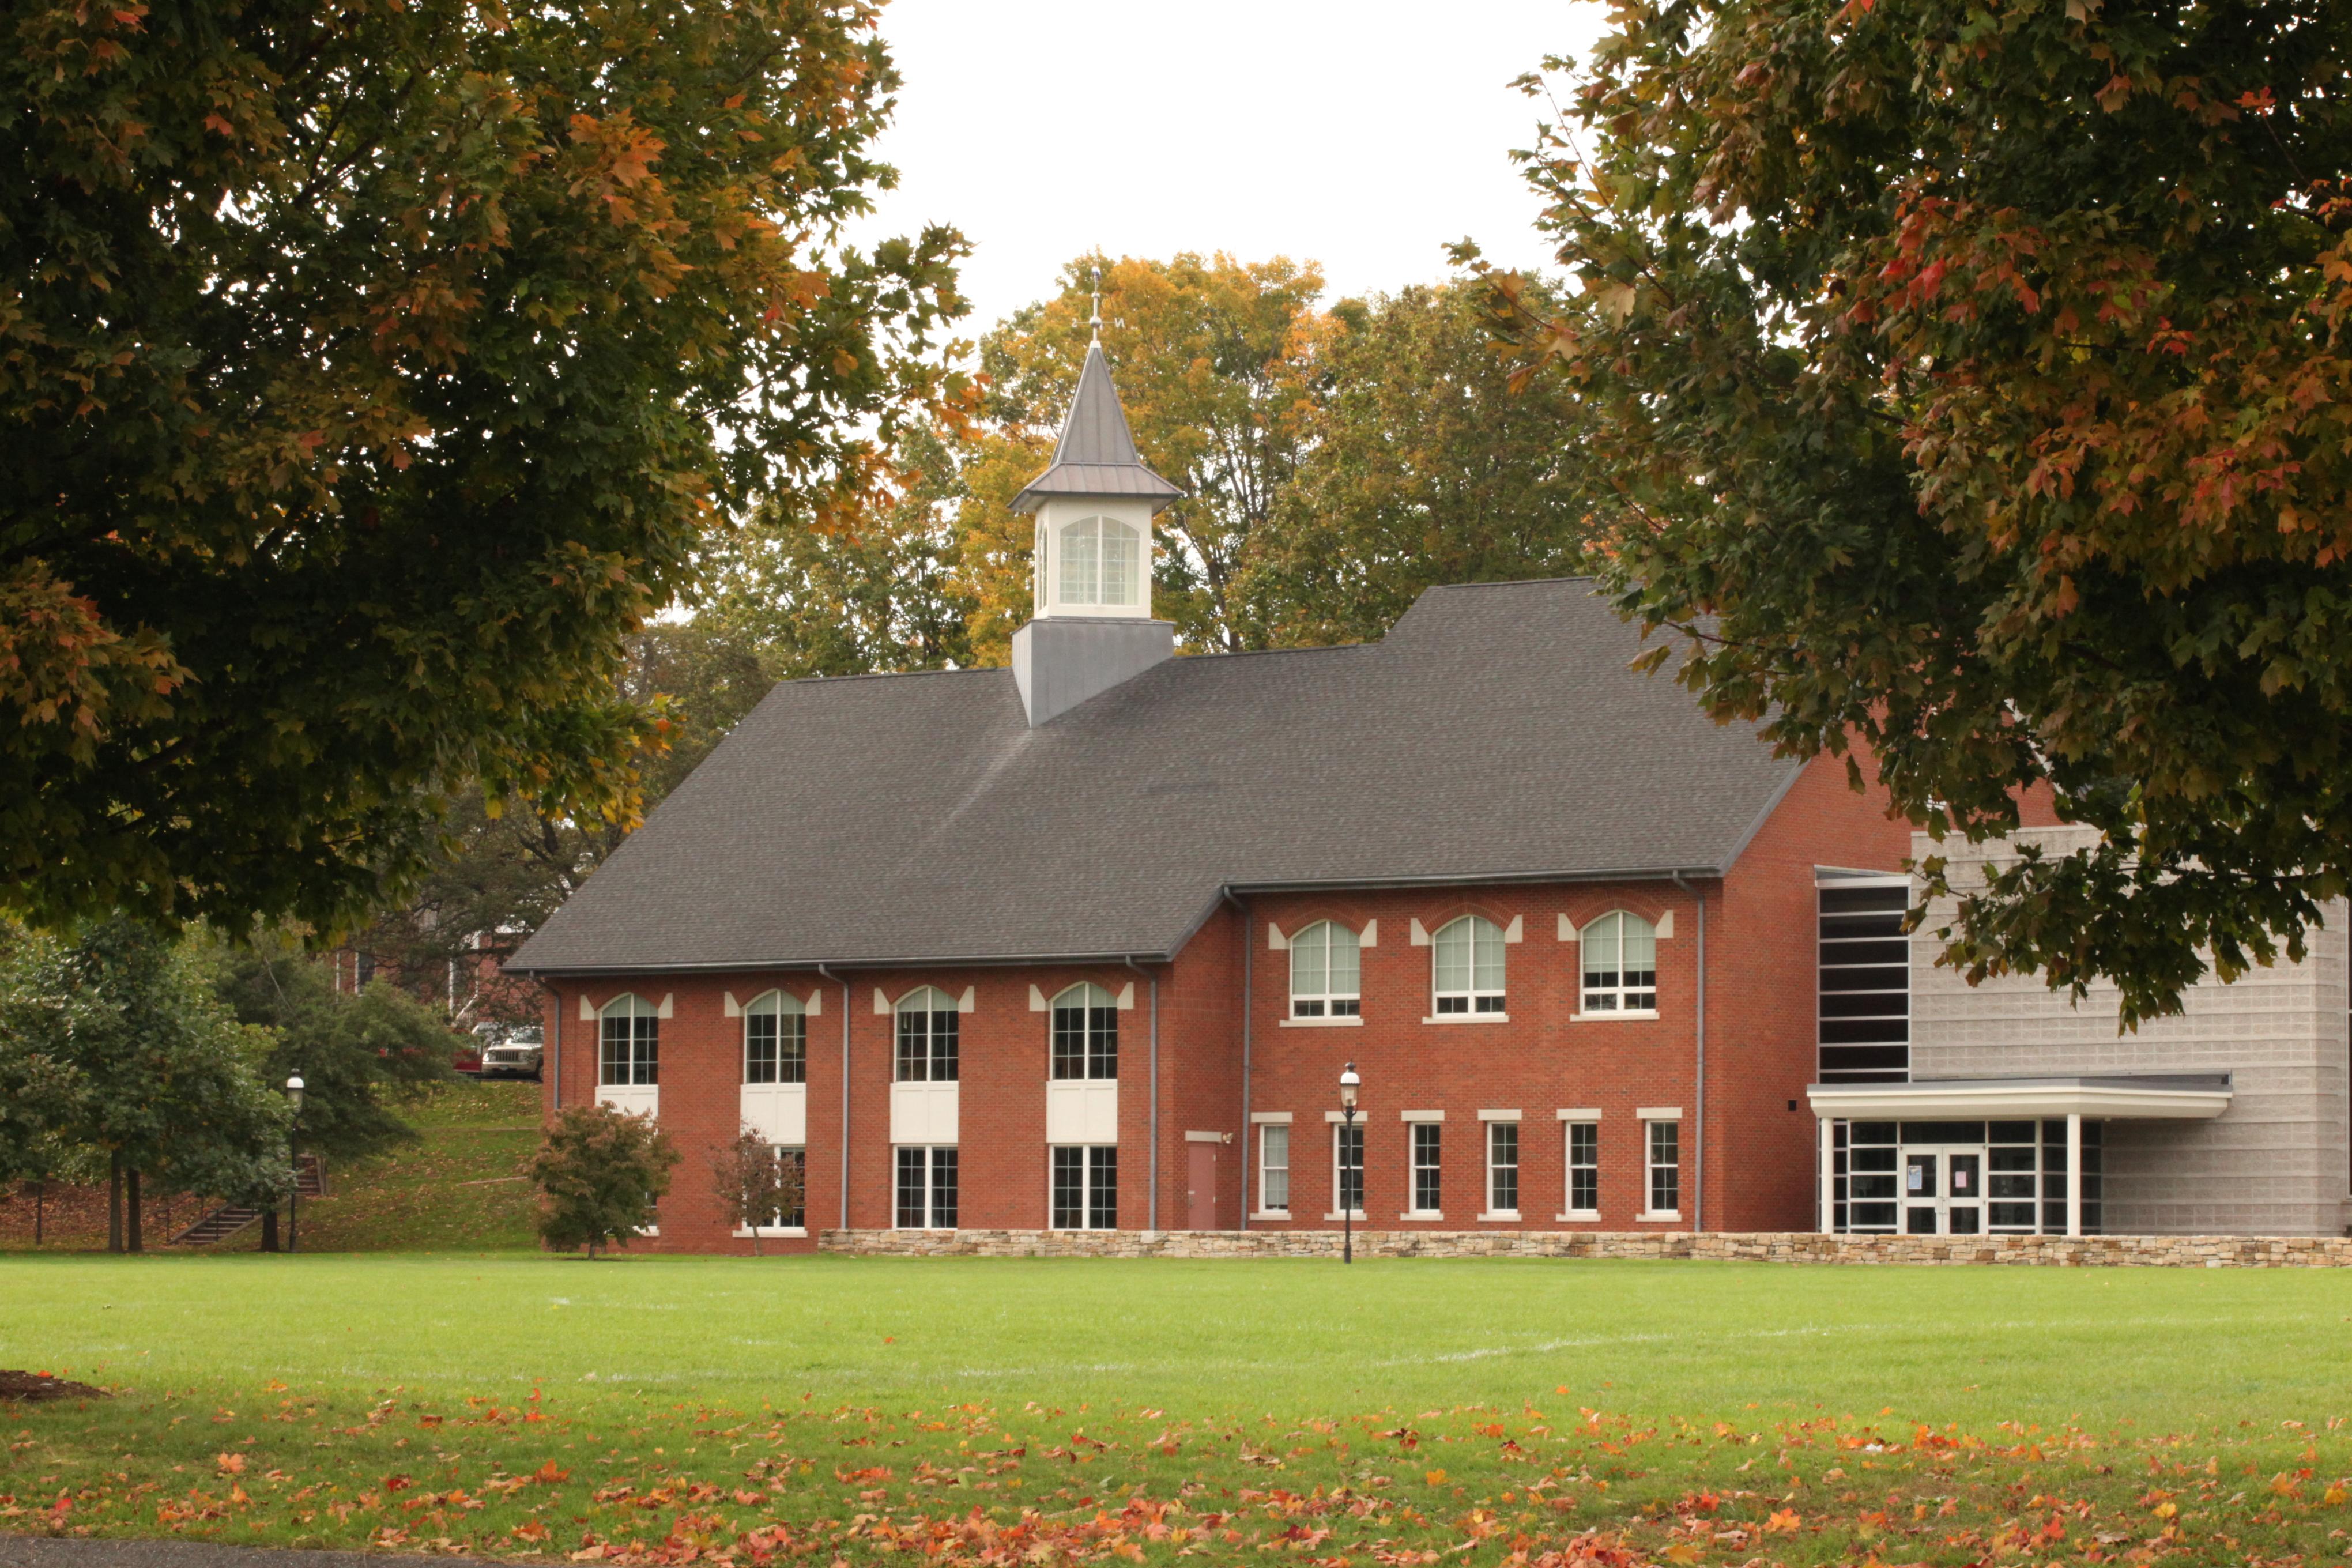 School - Cheshire Academy  4